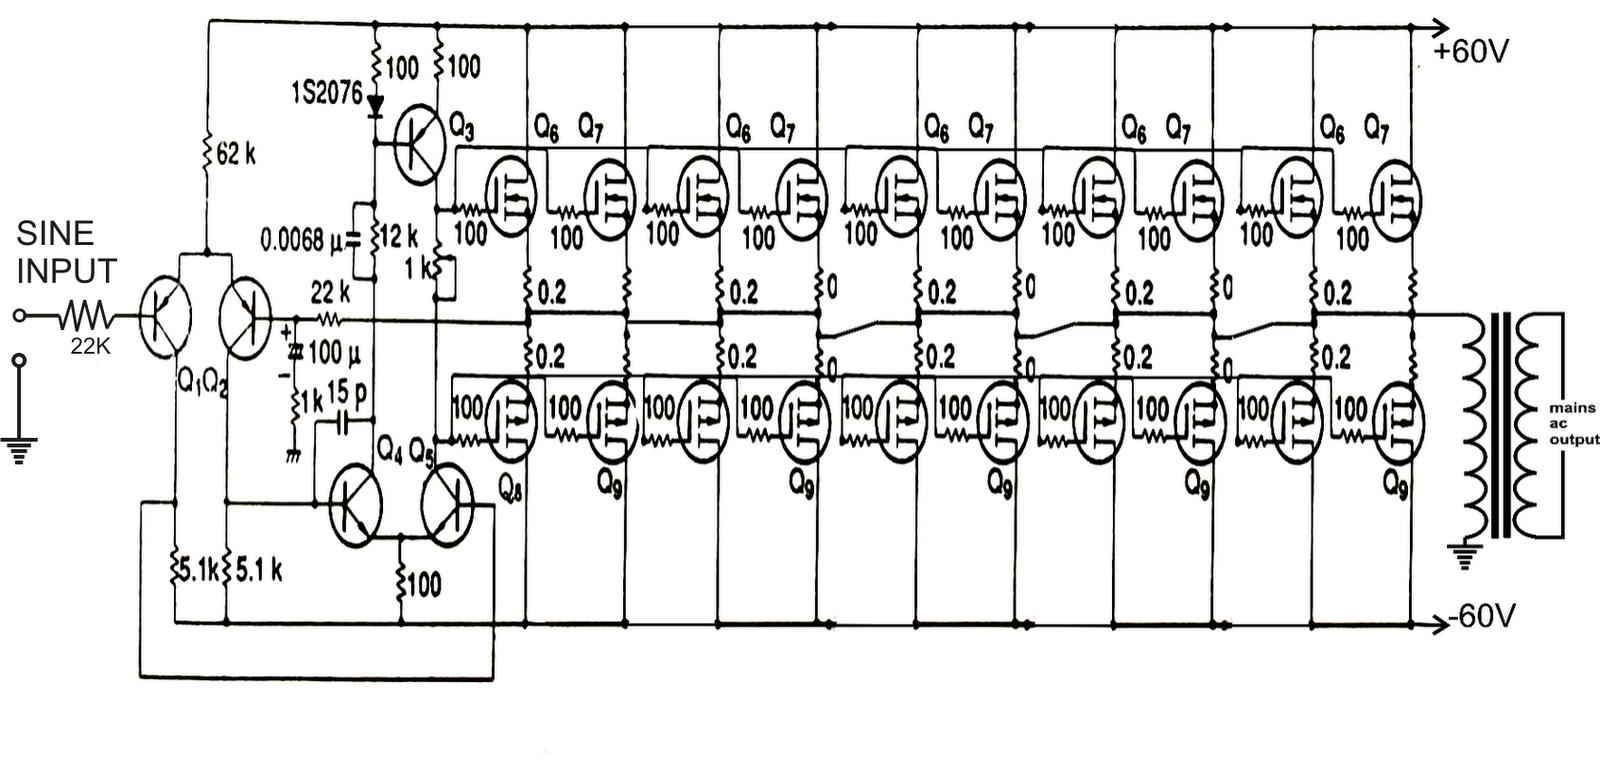 2n Inverter Circuit